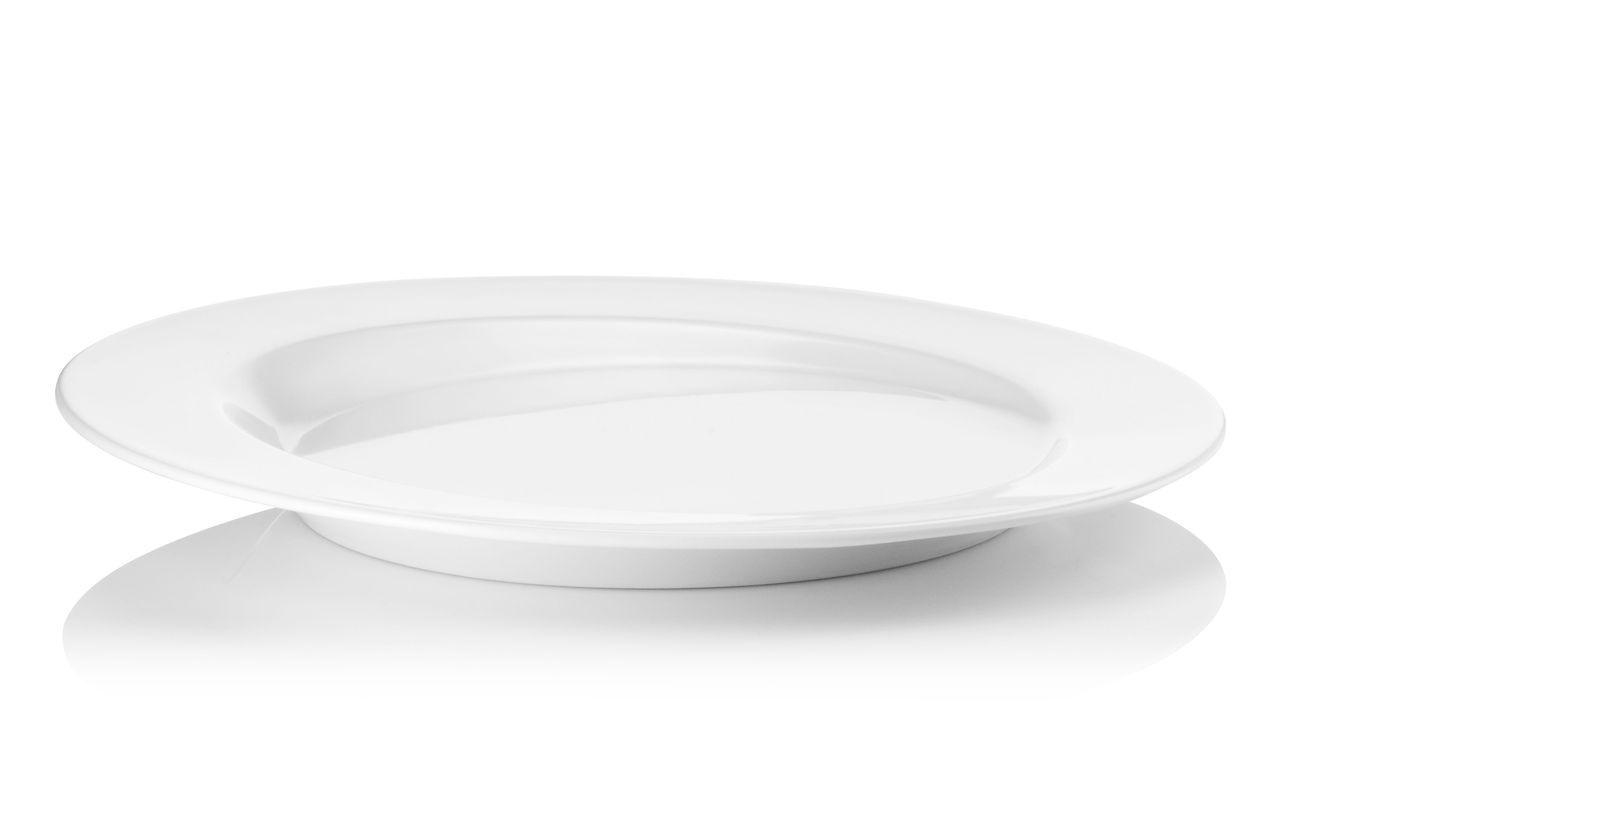 Eva Solo Servies Amfio Dinerbord Ø 29 cm